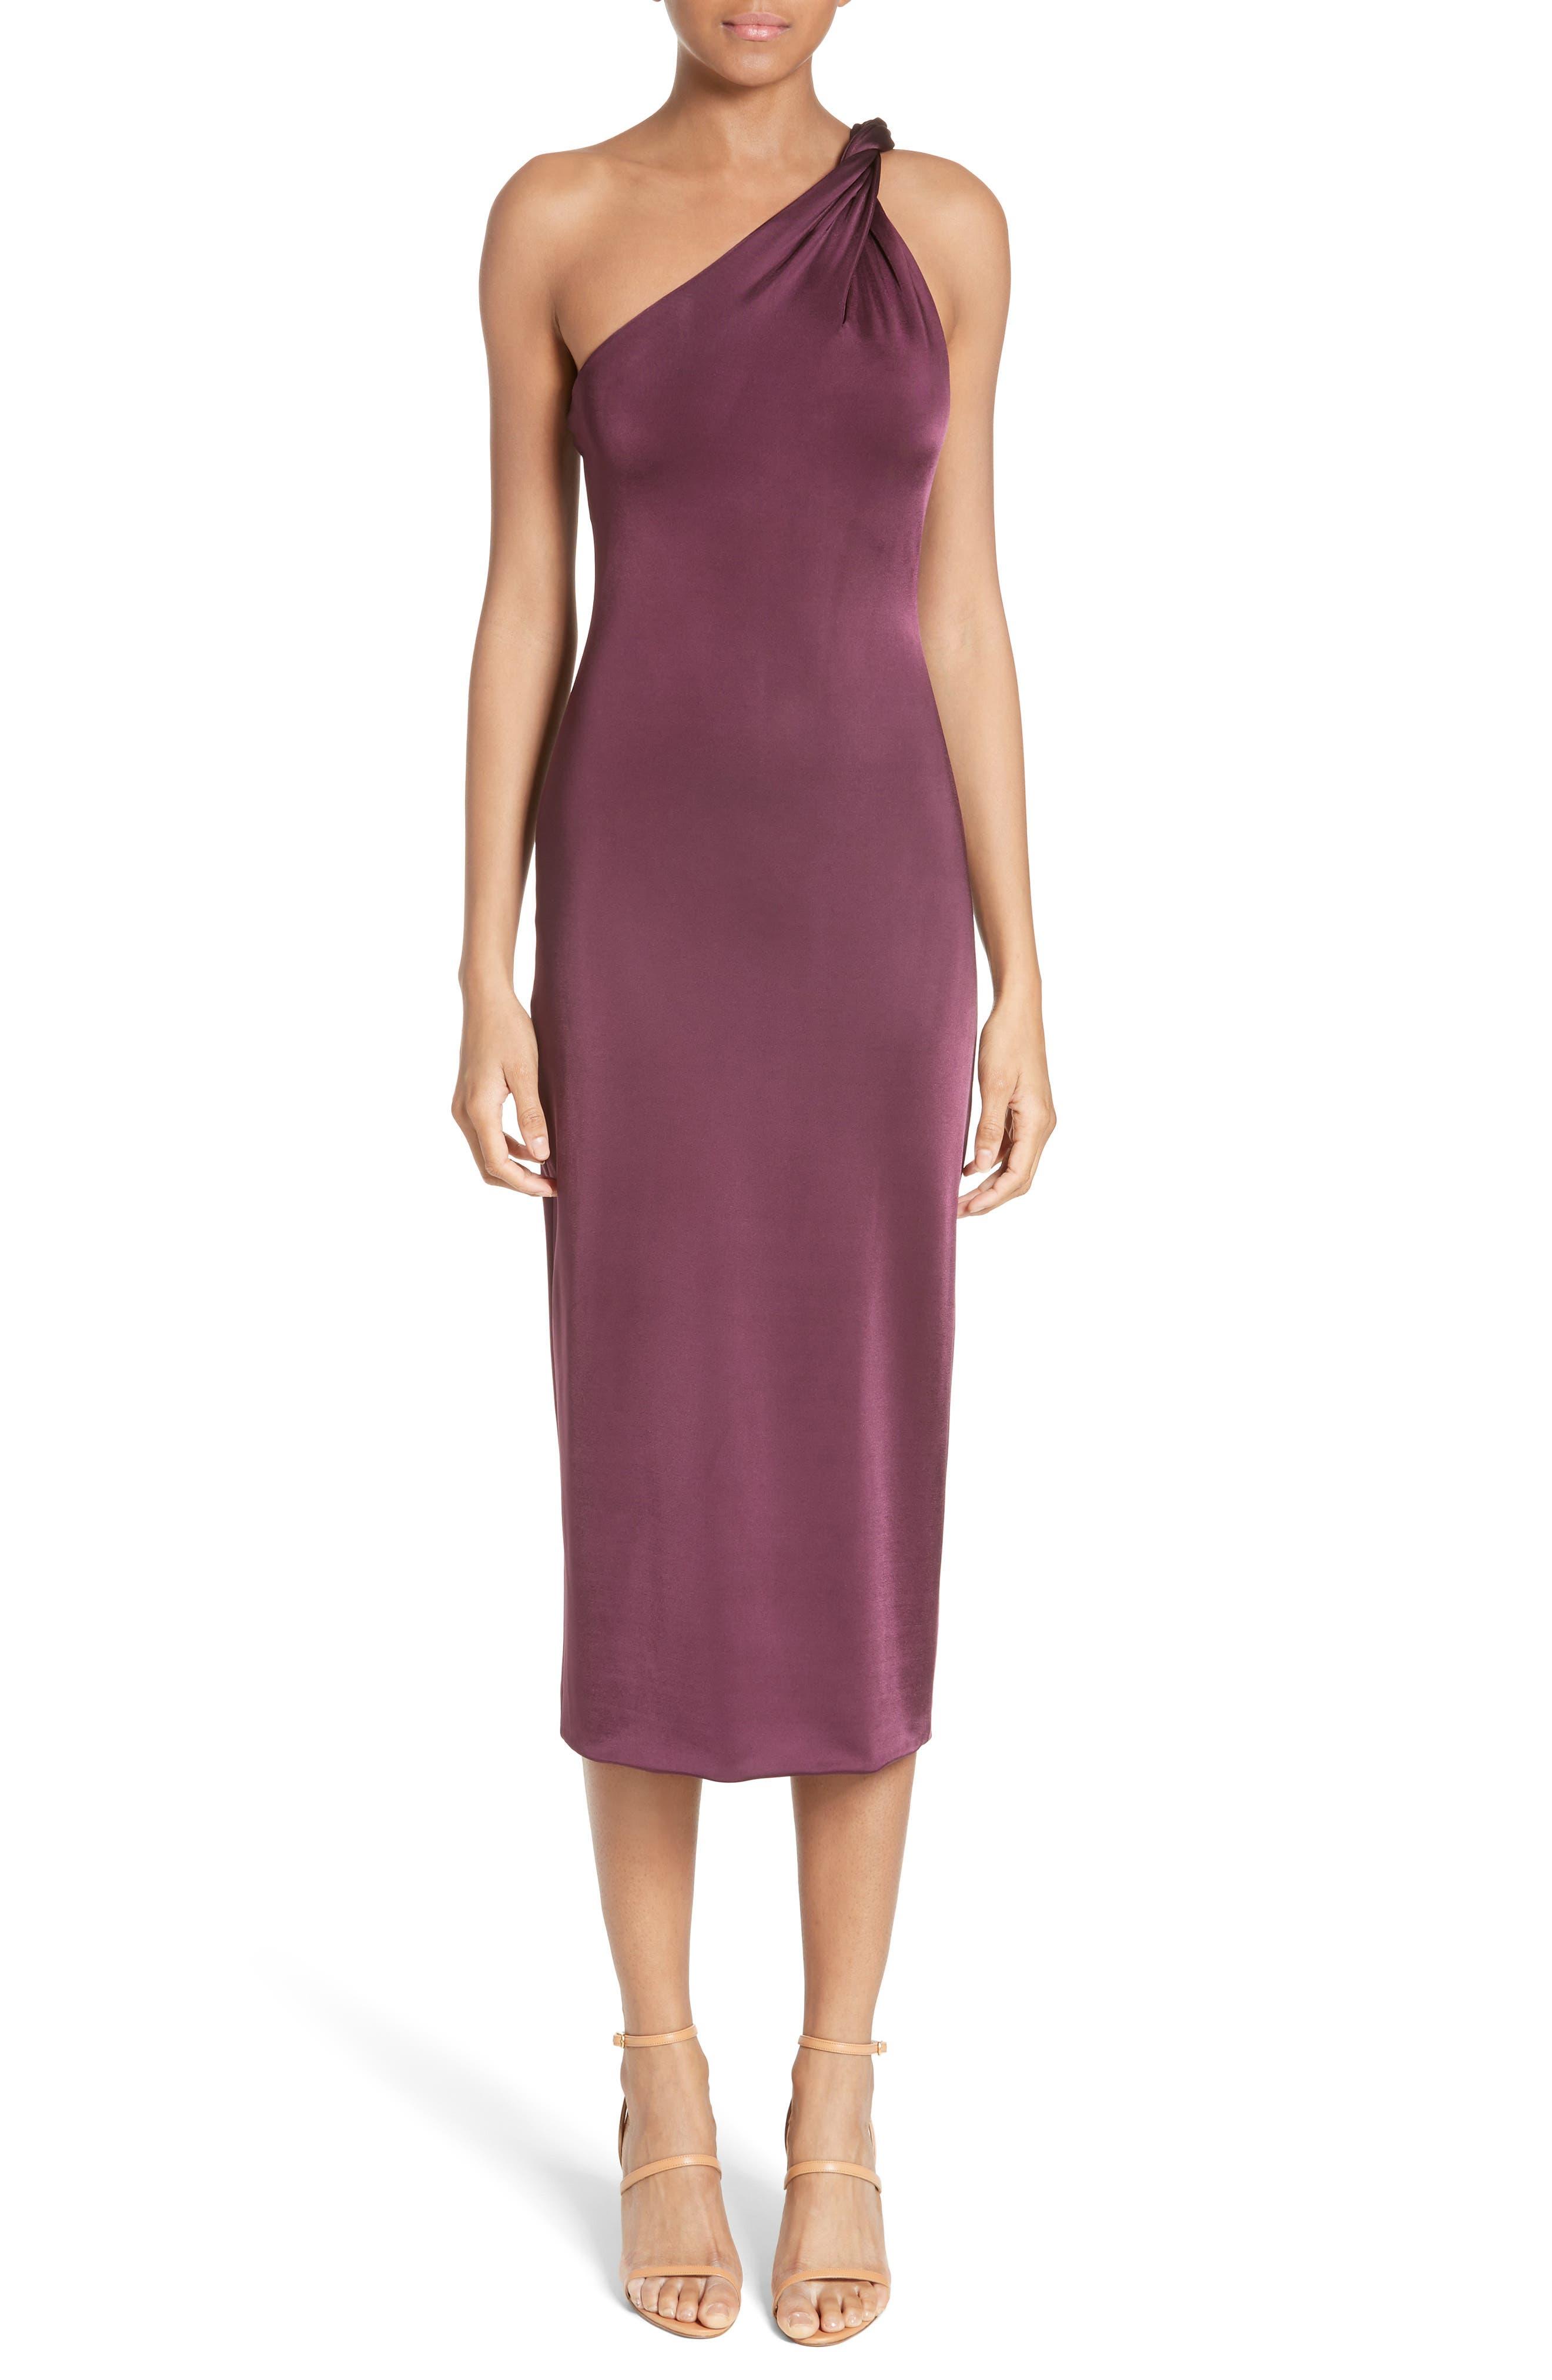 Cushnie et Ochs Twisted Jersey One-Shoulder Dress